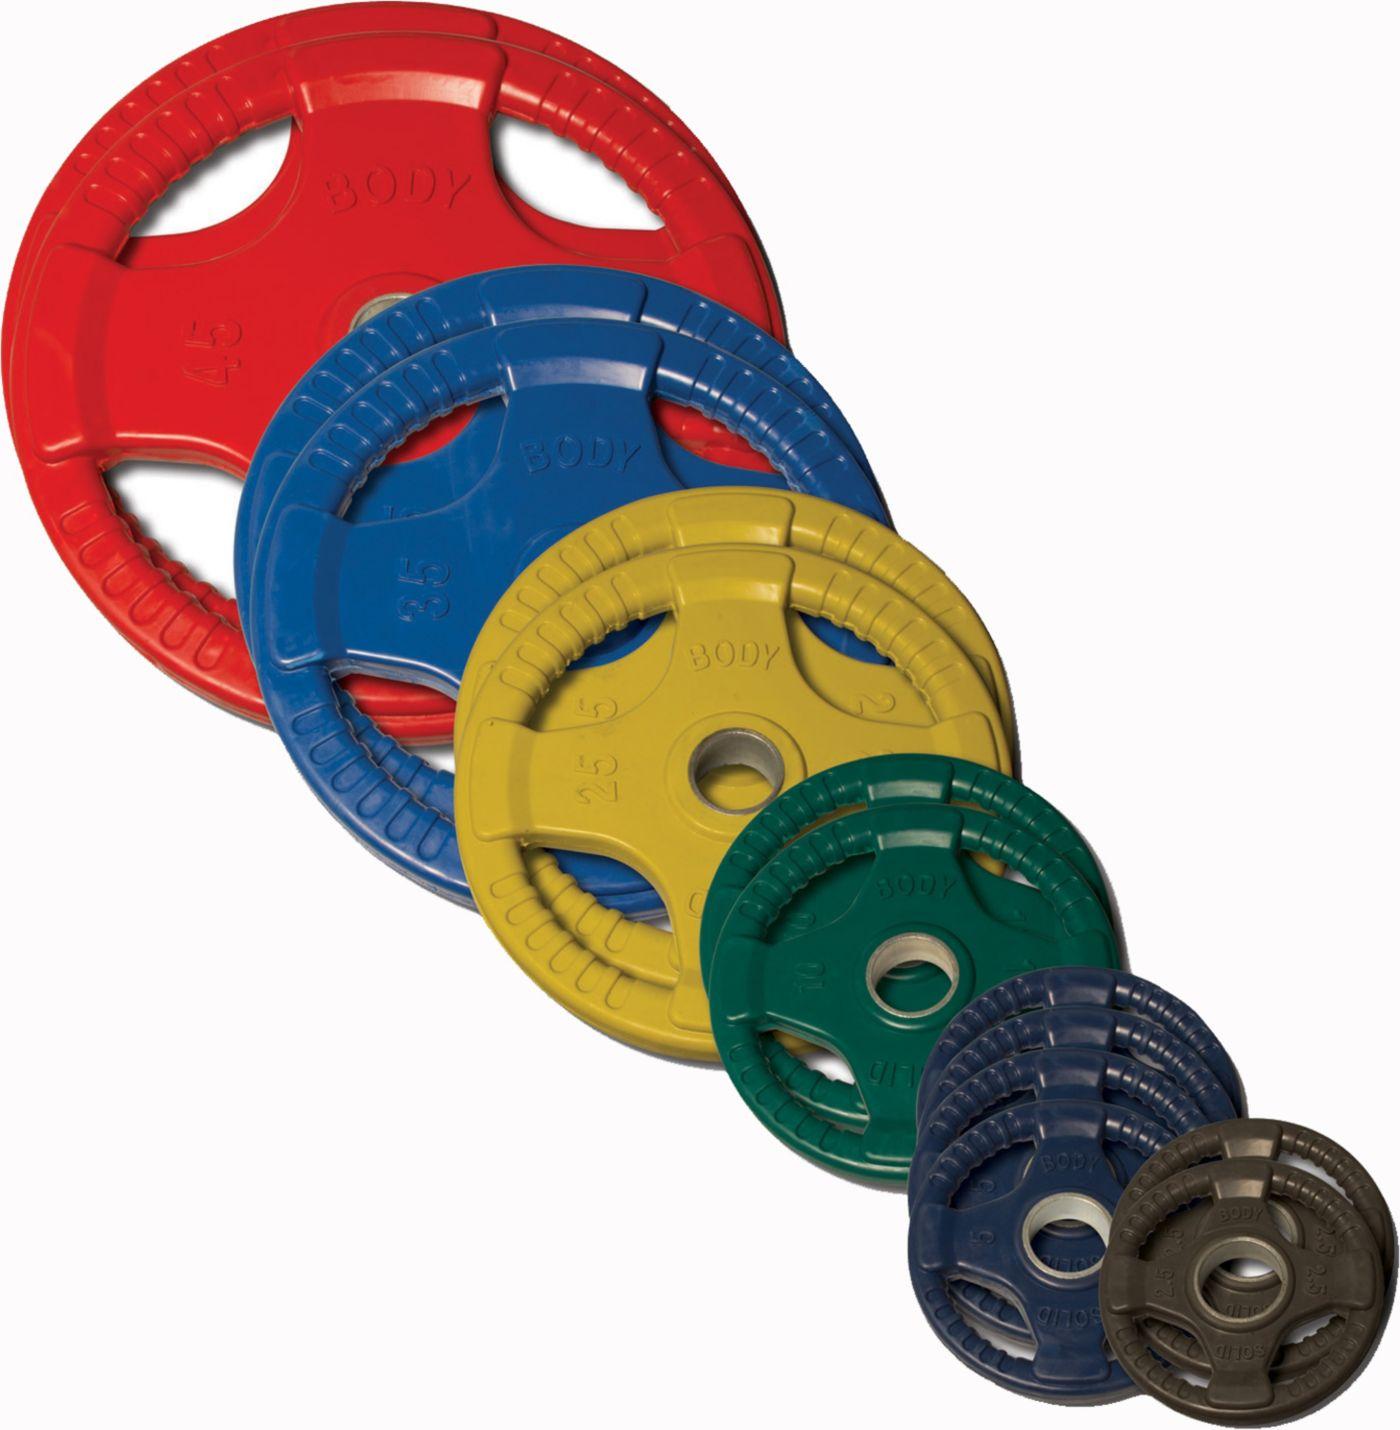 Body Solid 255 lb Olympic Bumper Set